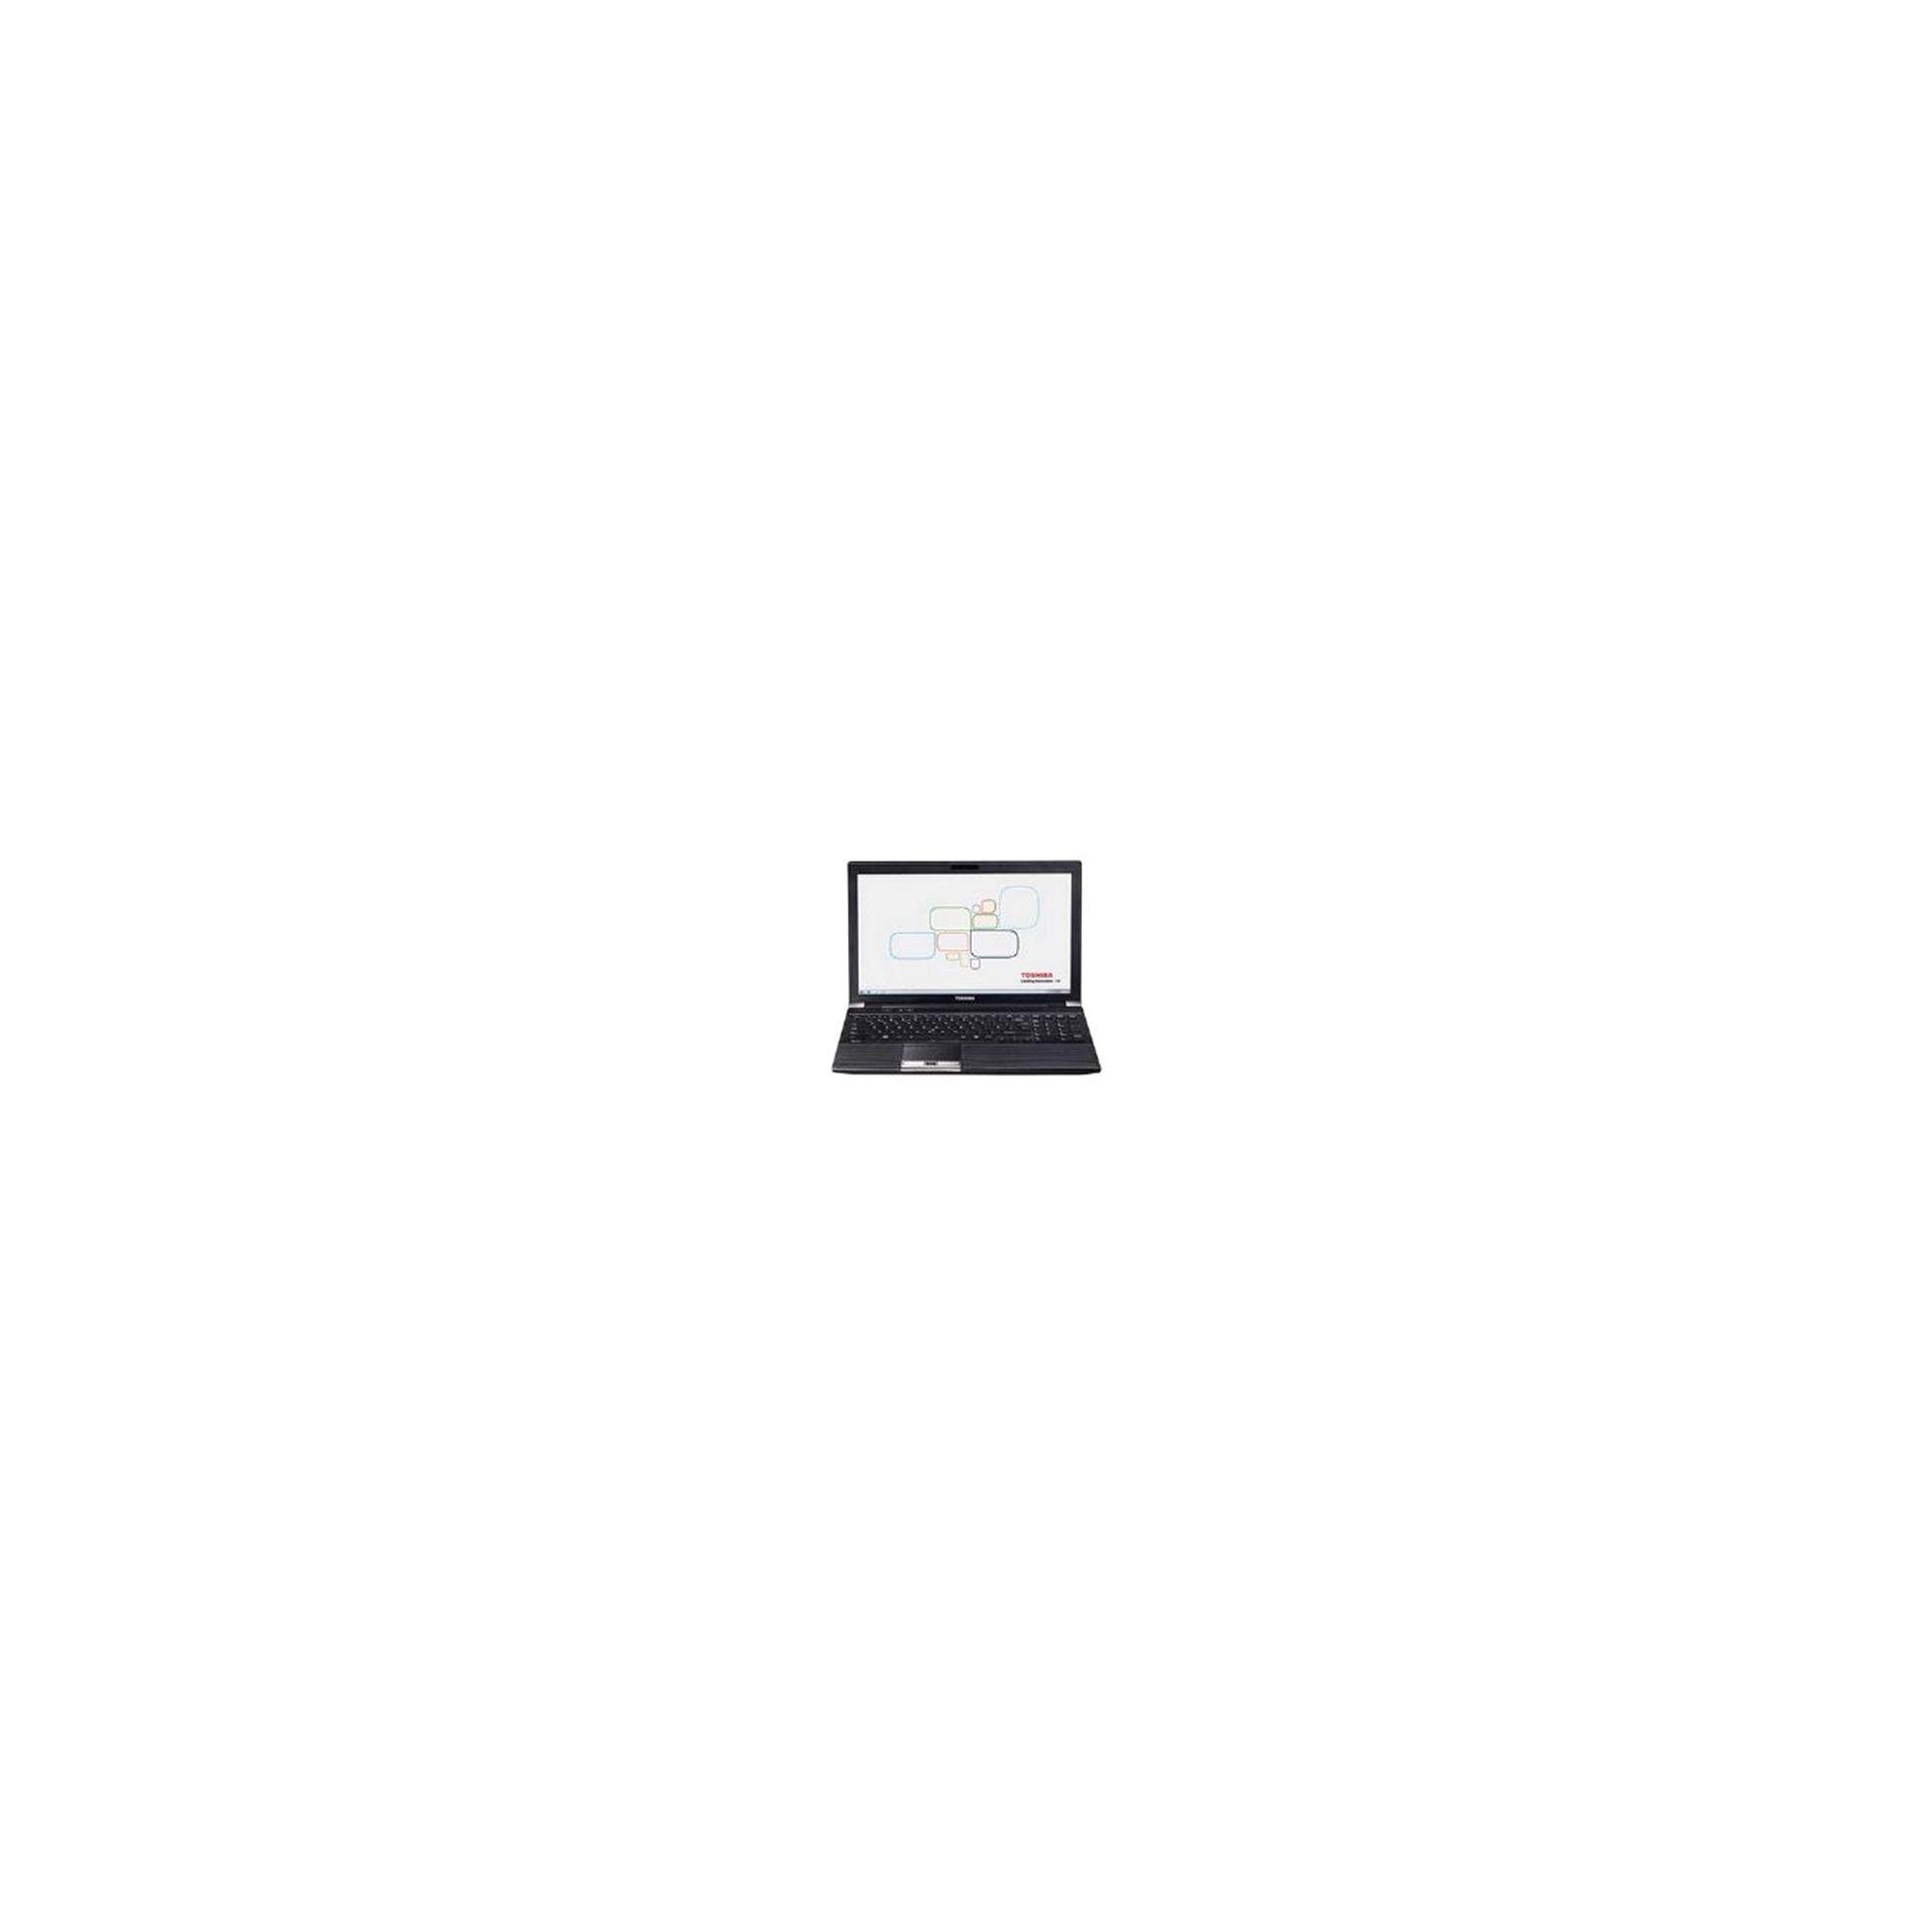 Toshiba Tecra R950-1EM (15. 6 inch) Notebook Core i5 (3340M) 2. at Tescos Direct